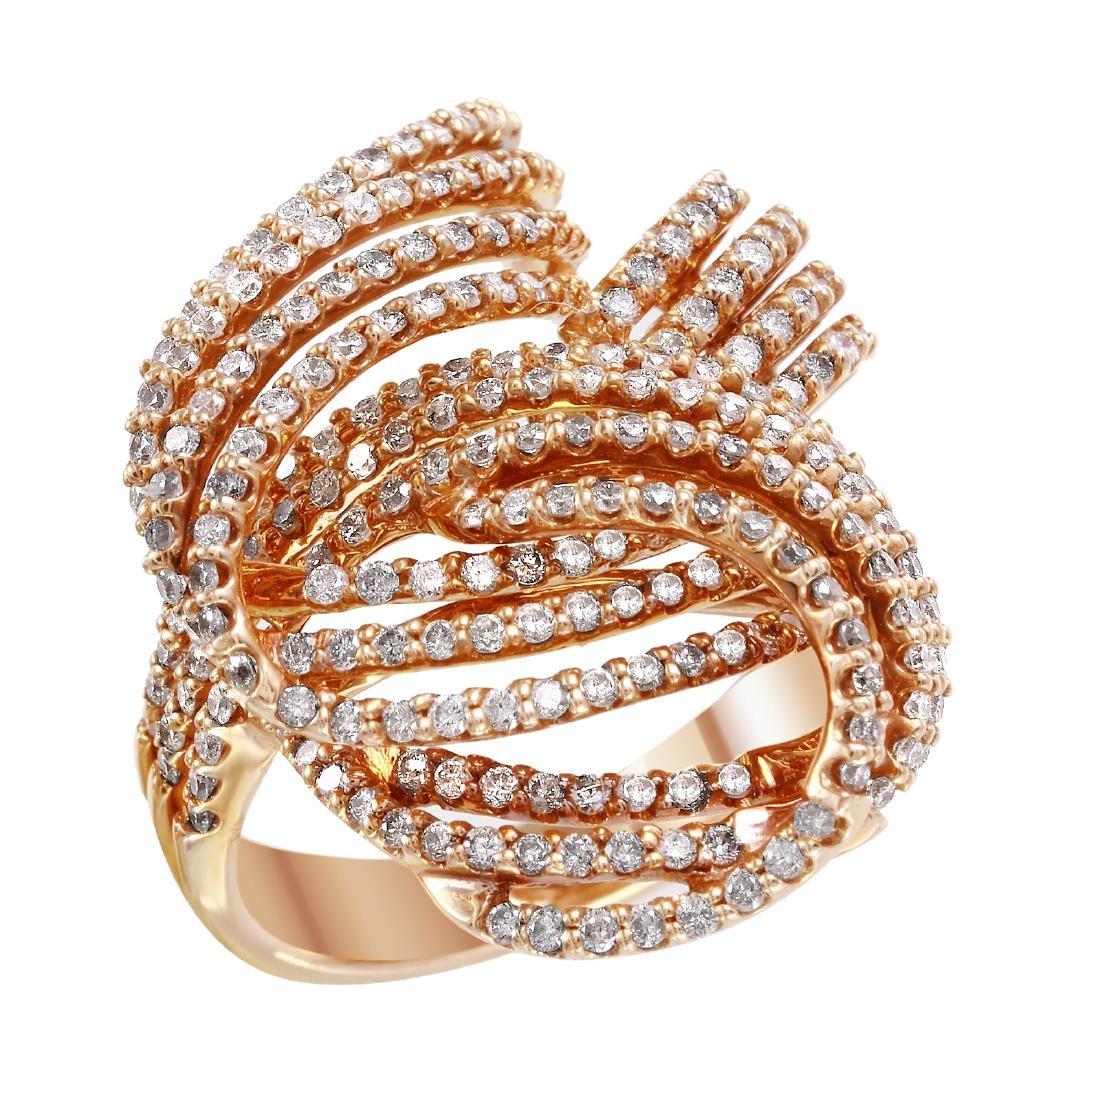 14KT Rose Gold 1.58ctw Diamond Knot Ring Size 7 L1995